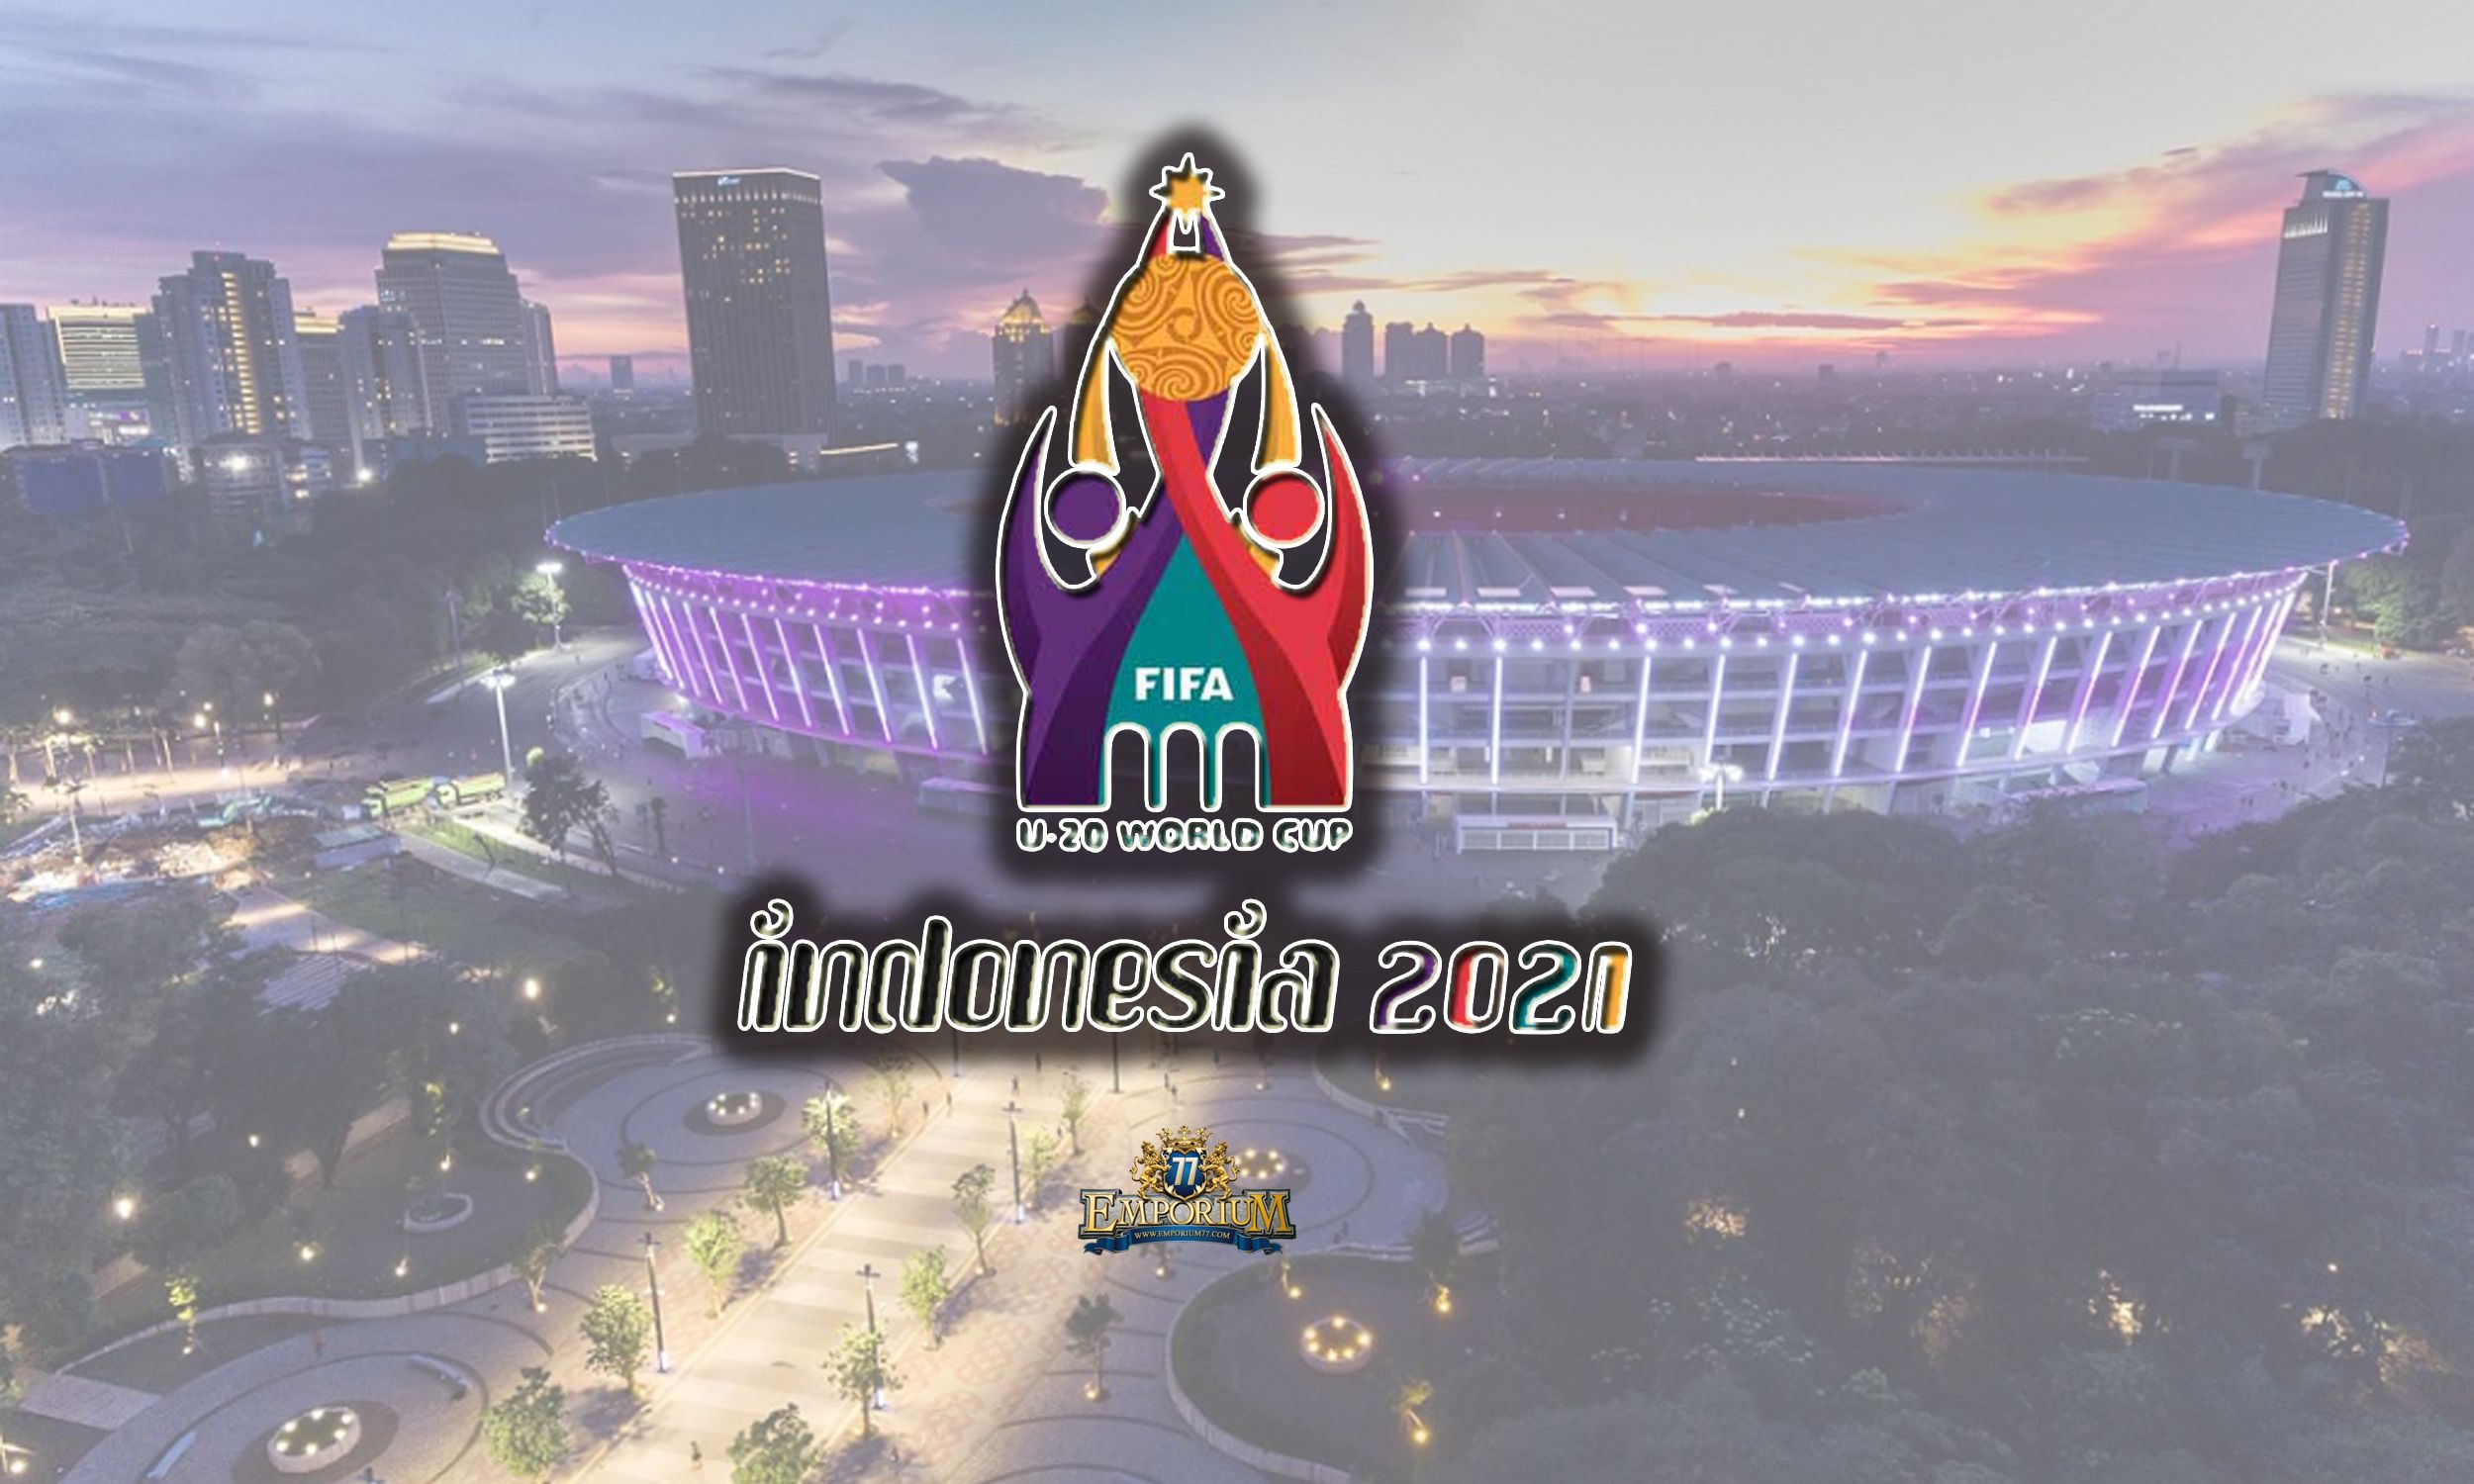 Selamat Indonesia Menjadi Tuan Rumah Piala Dunia U 20 2021 Dengan Gambar Fifa Piala Dunia Indonesia